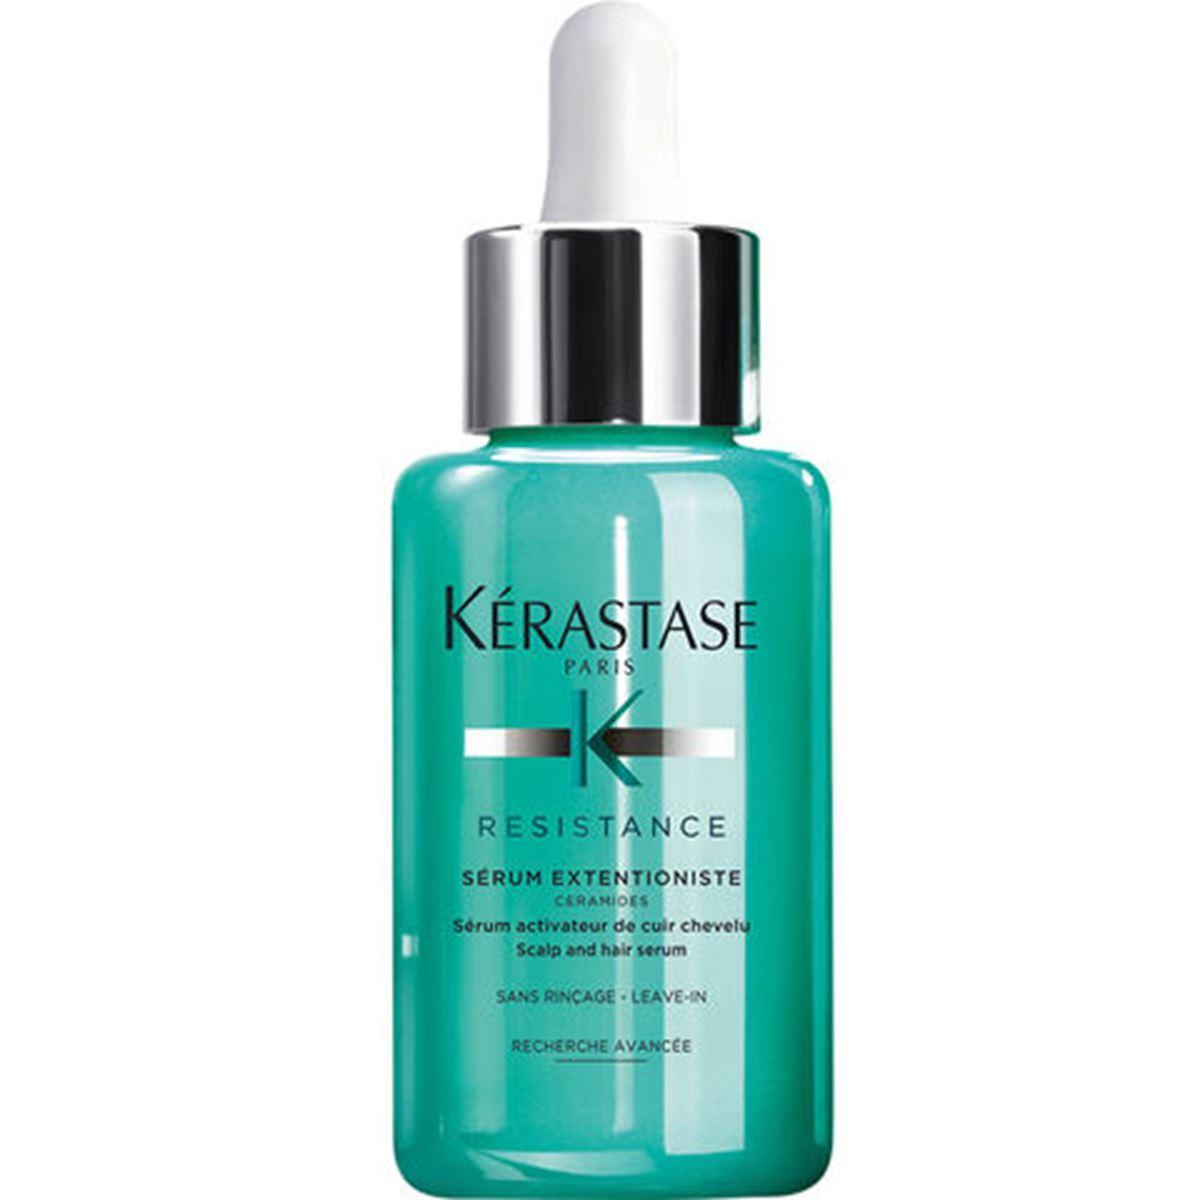 Kerastase Extentioniste Canlancırıcı Serum 50 ml